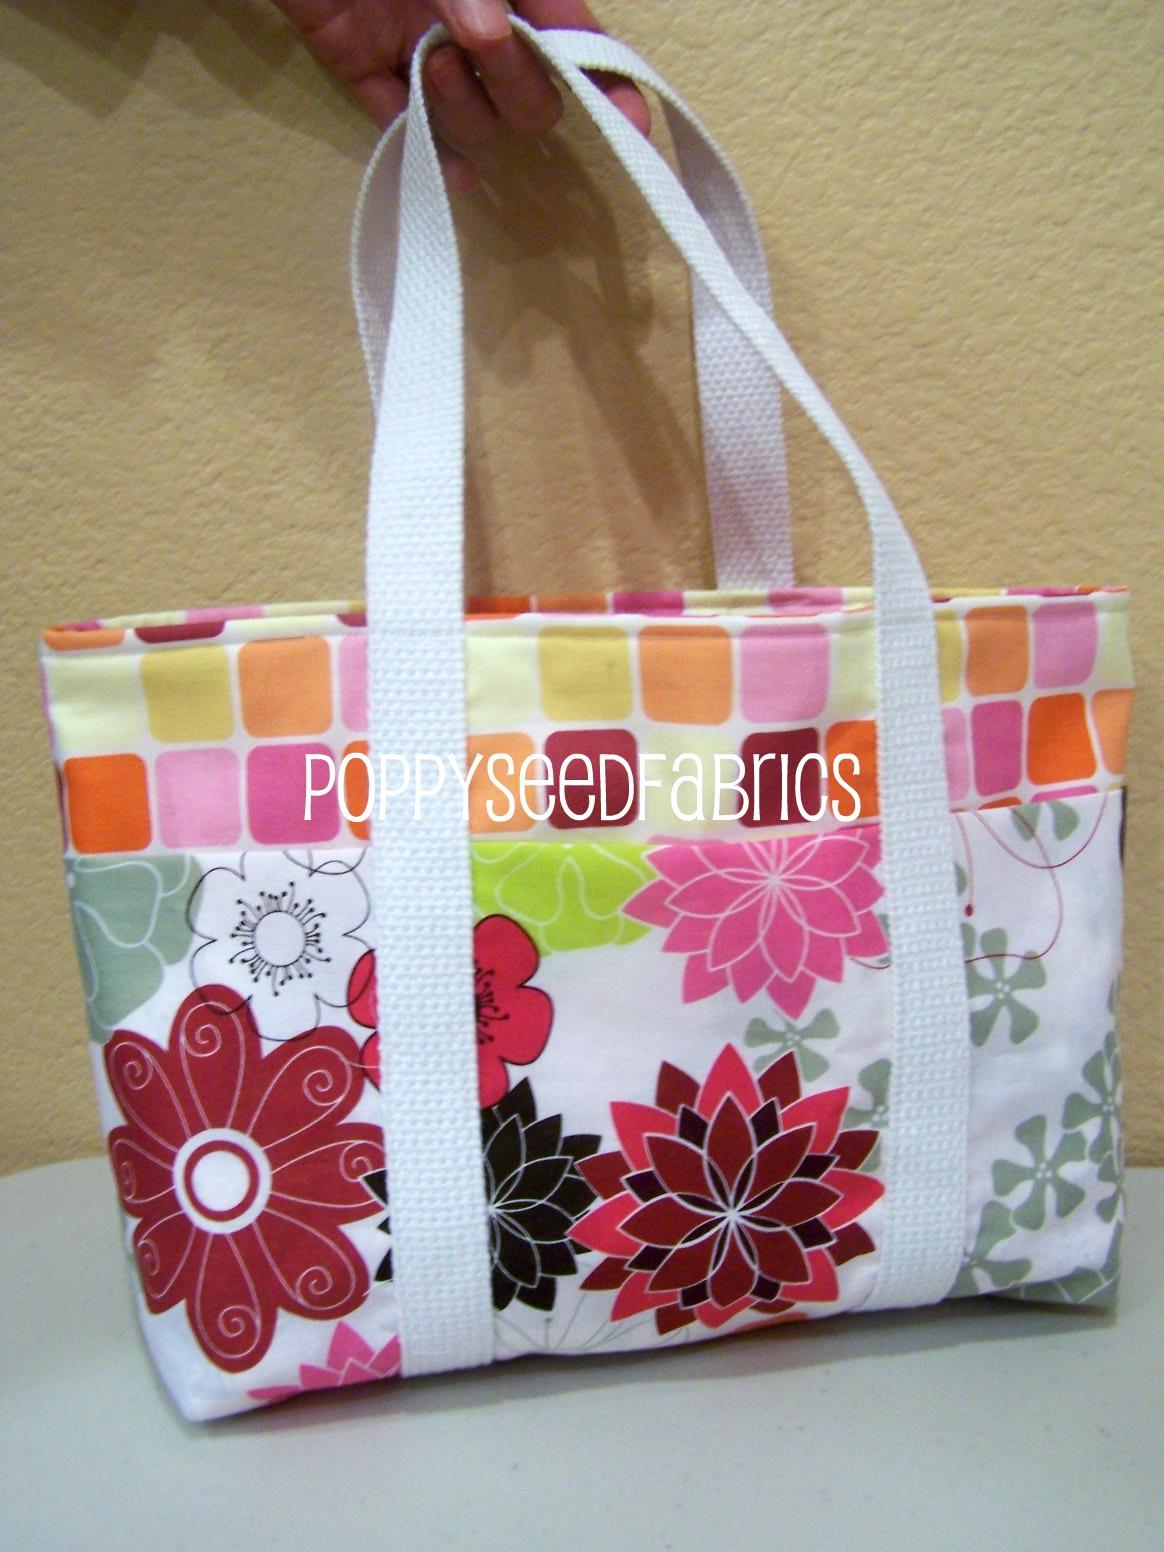 poppyseed fabrics super easy tote bag tutorial updated. Black Bedroom Furniture Sets. Home Design Ideas